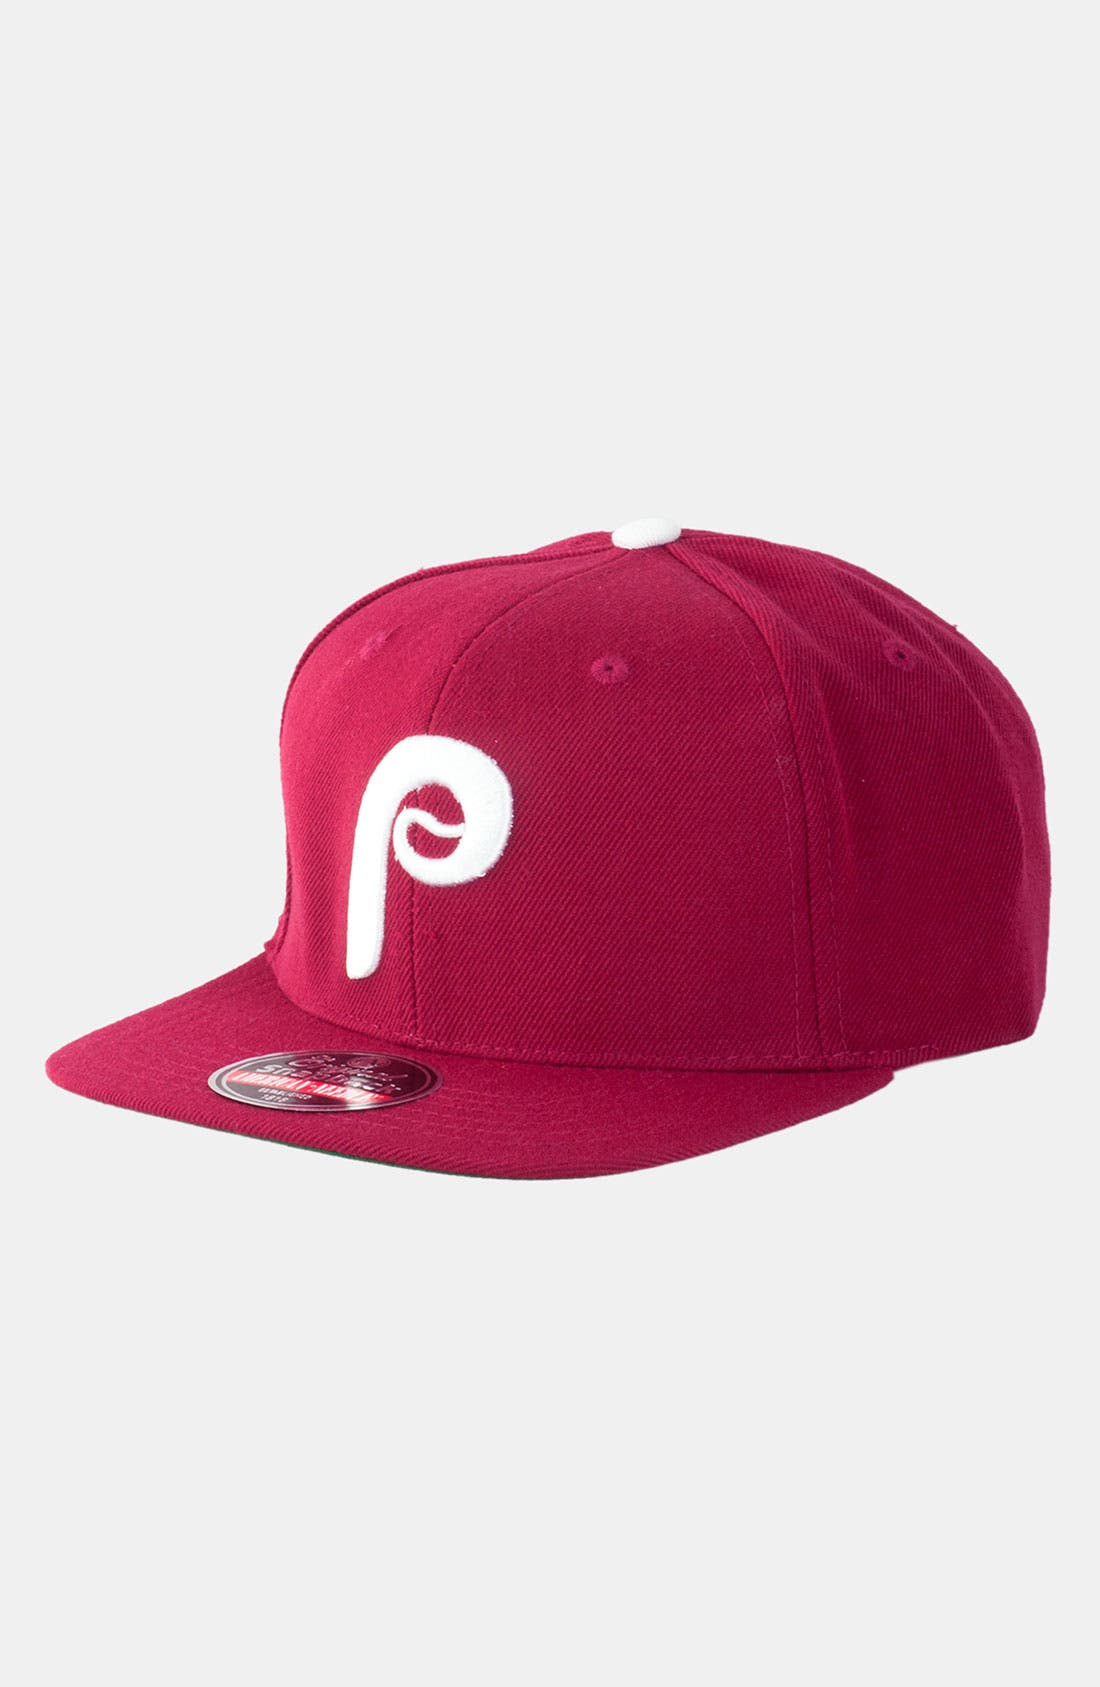 Alternate Image 1 Selected - American Needle 'Philadelphia Phillies - Cooperstown' Snapback Baseball Cap